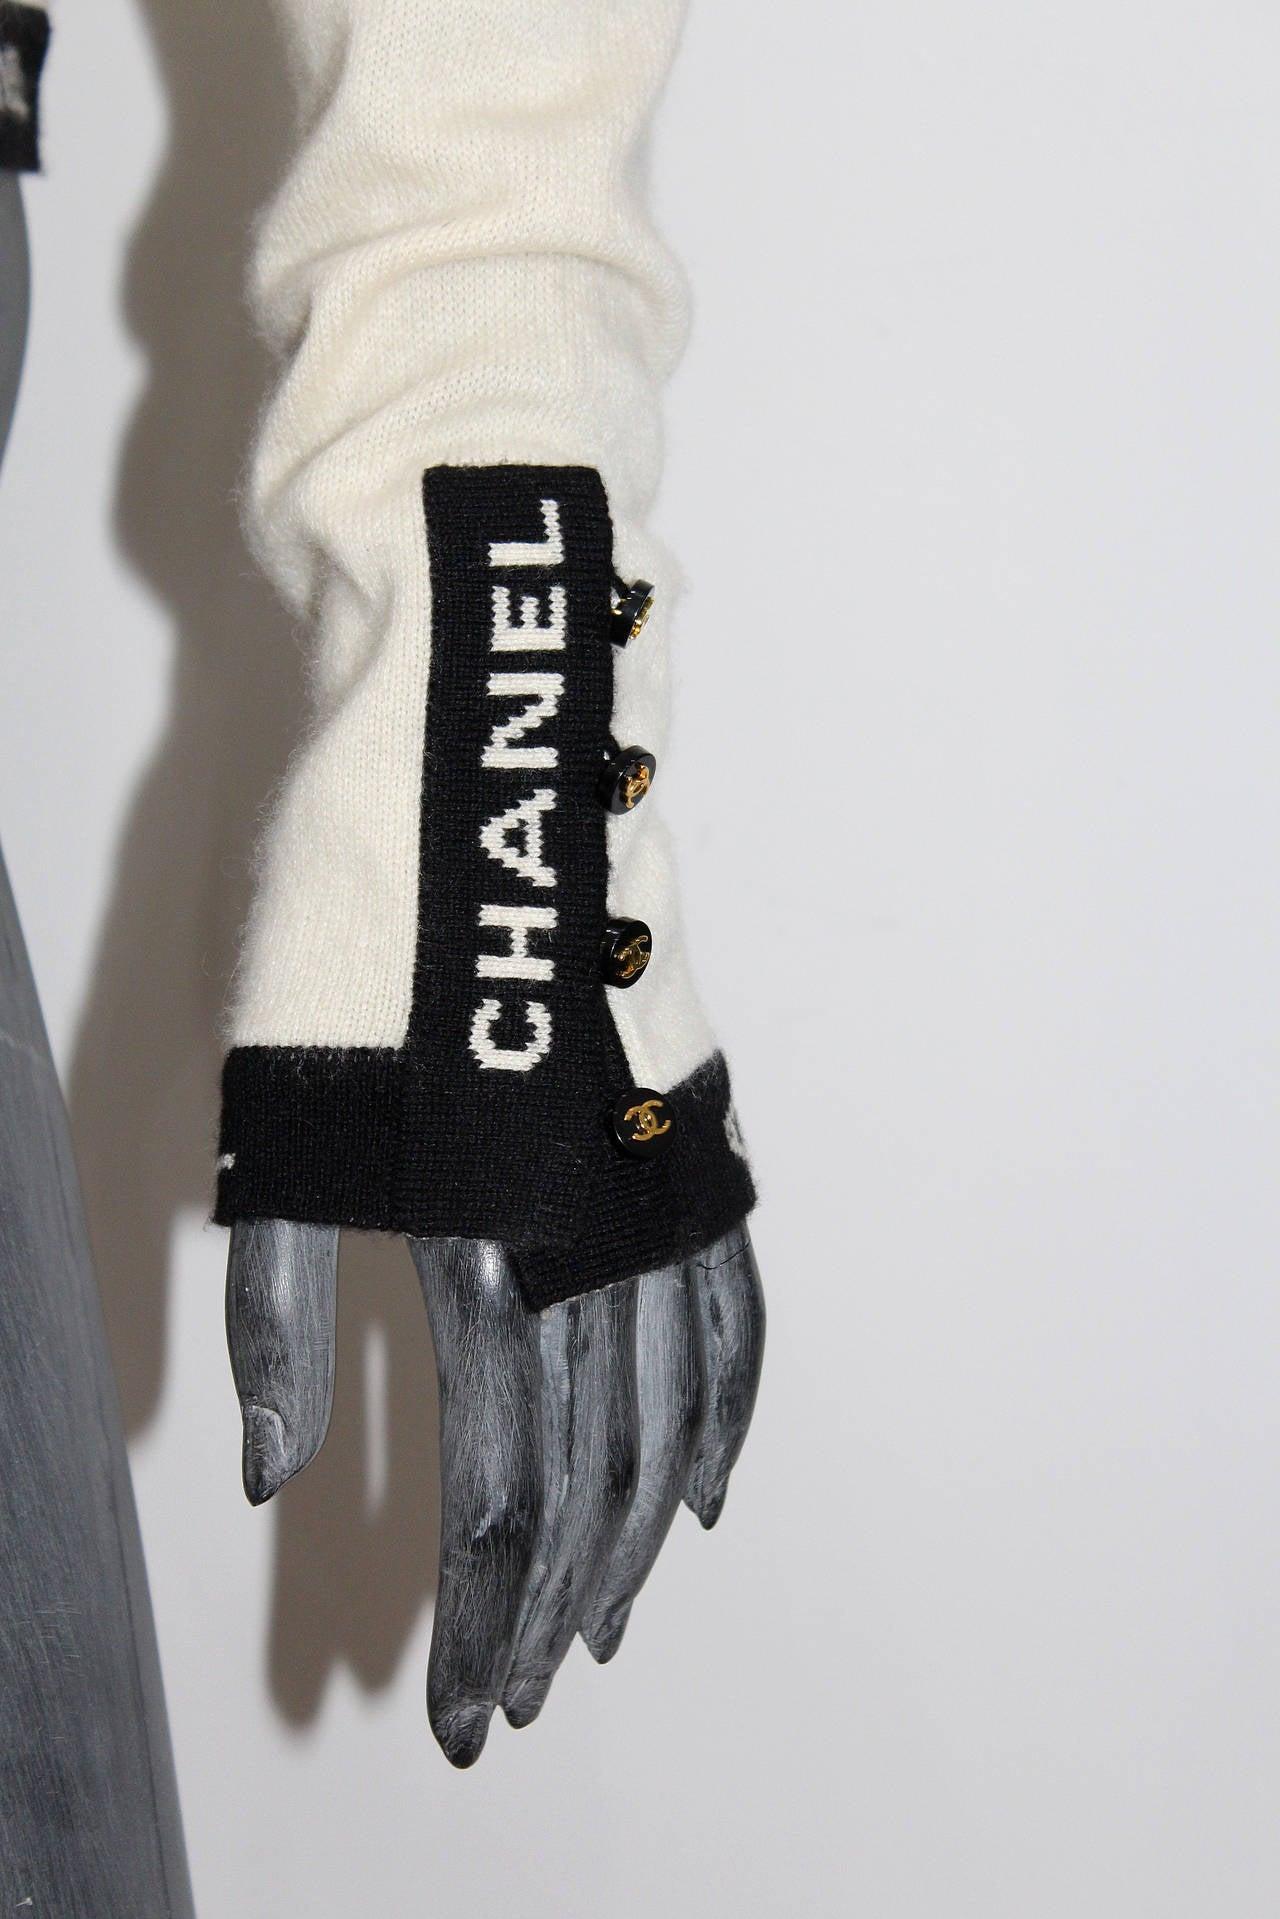 Iconic Vintage Chanel Logo Cashmere Cardigan 3